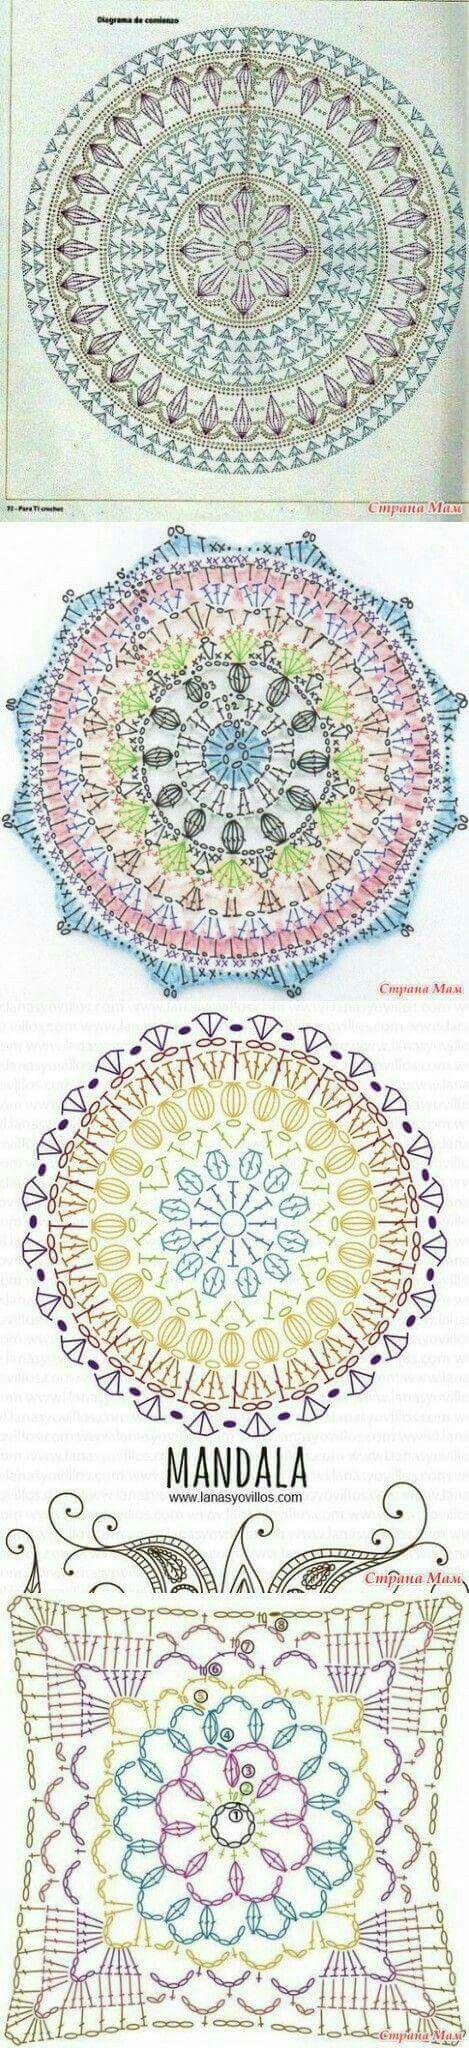 Mandales patrones | mandalas | Pinterest | Mandalas, Patrones y ...